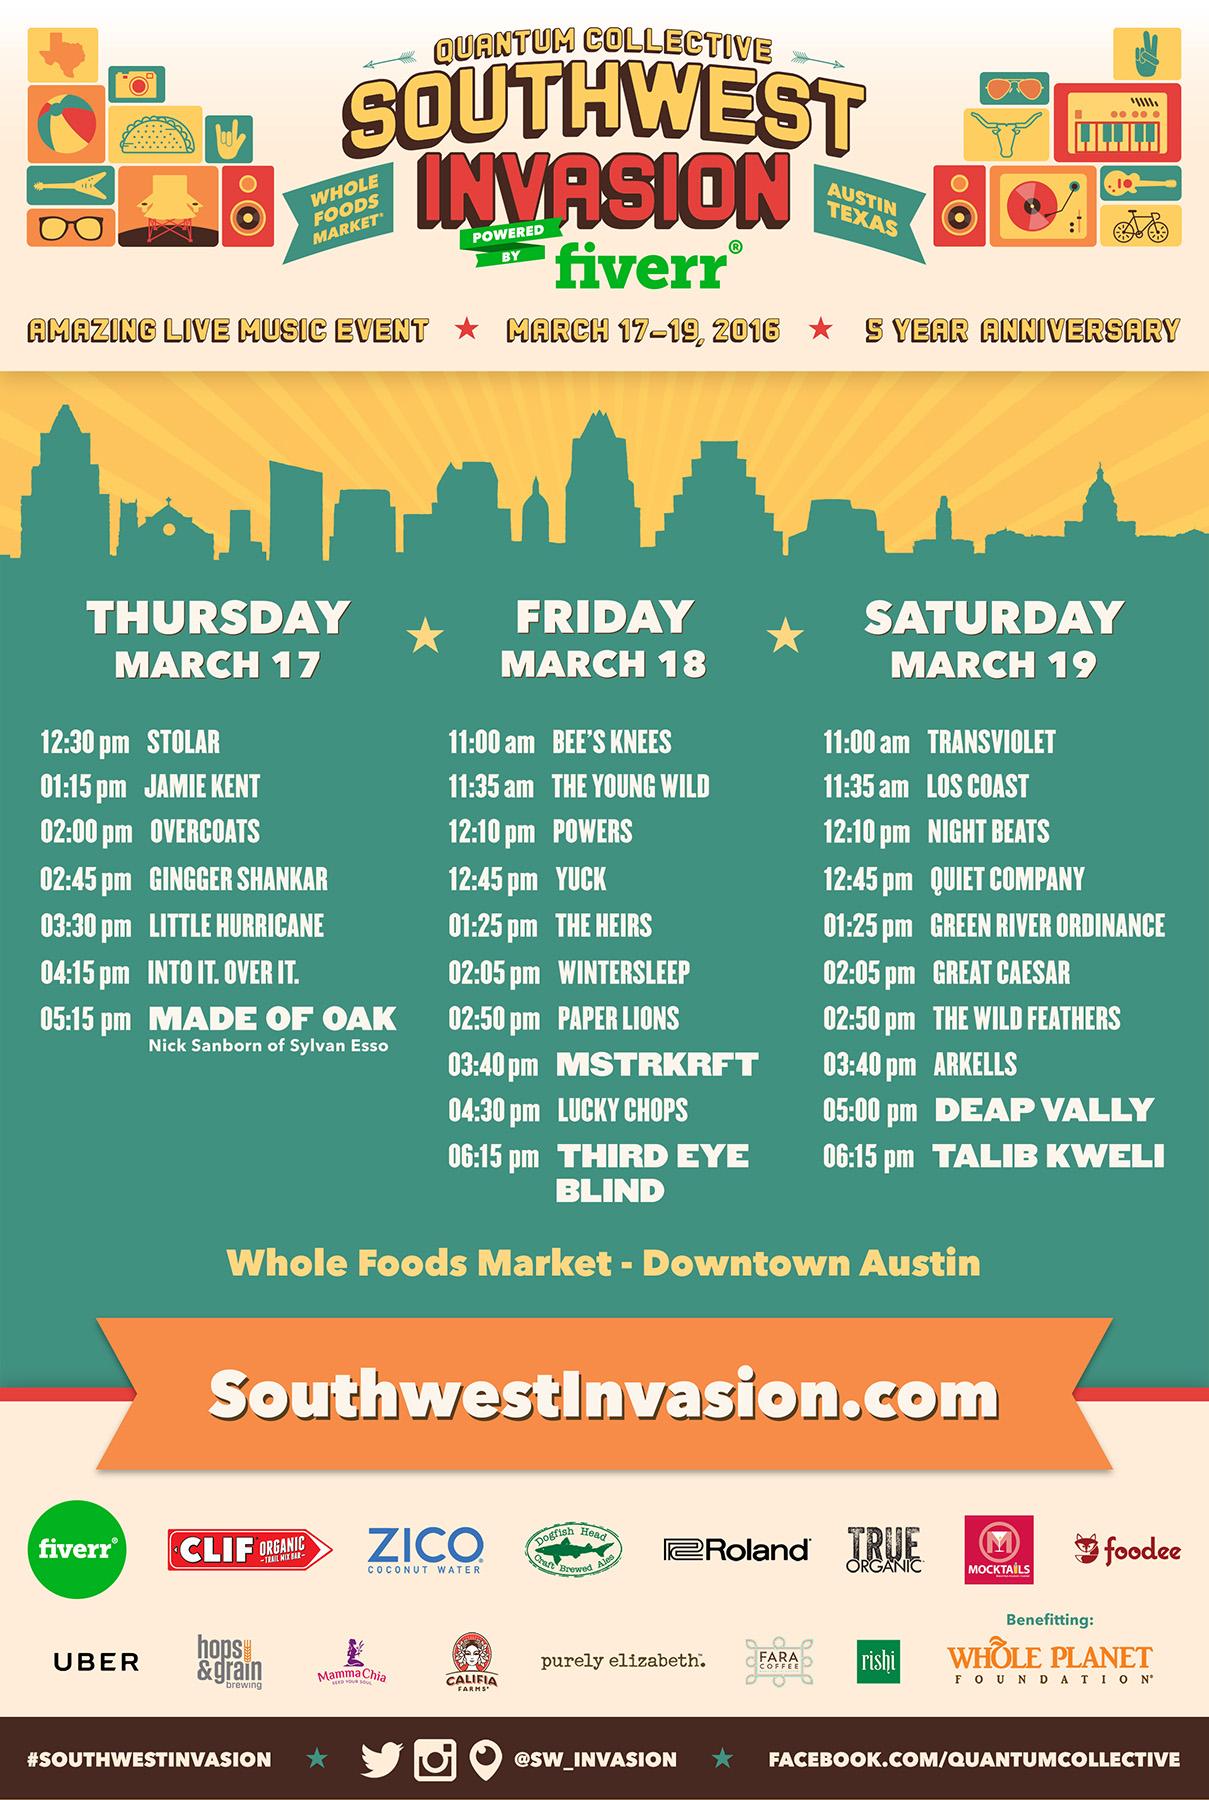 Southwest Invasion 2016 - Full Artist Lineup